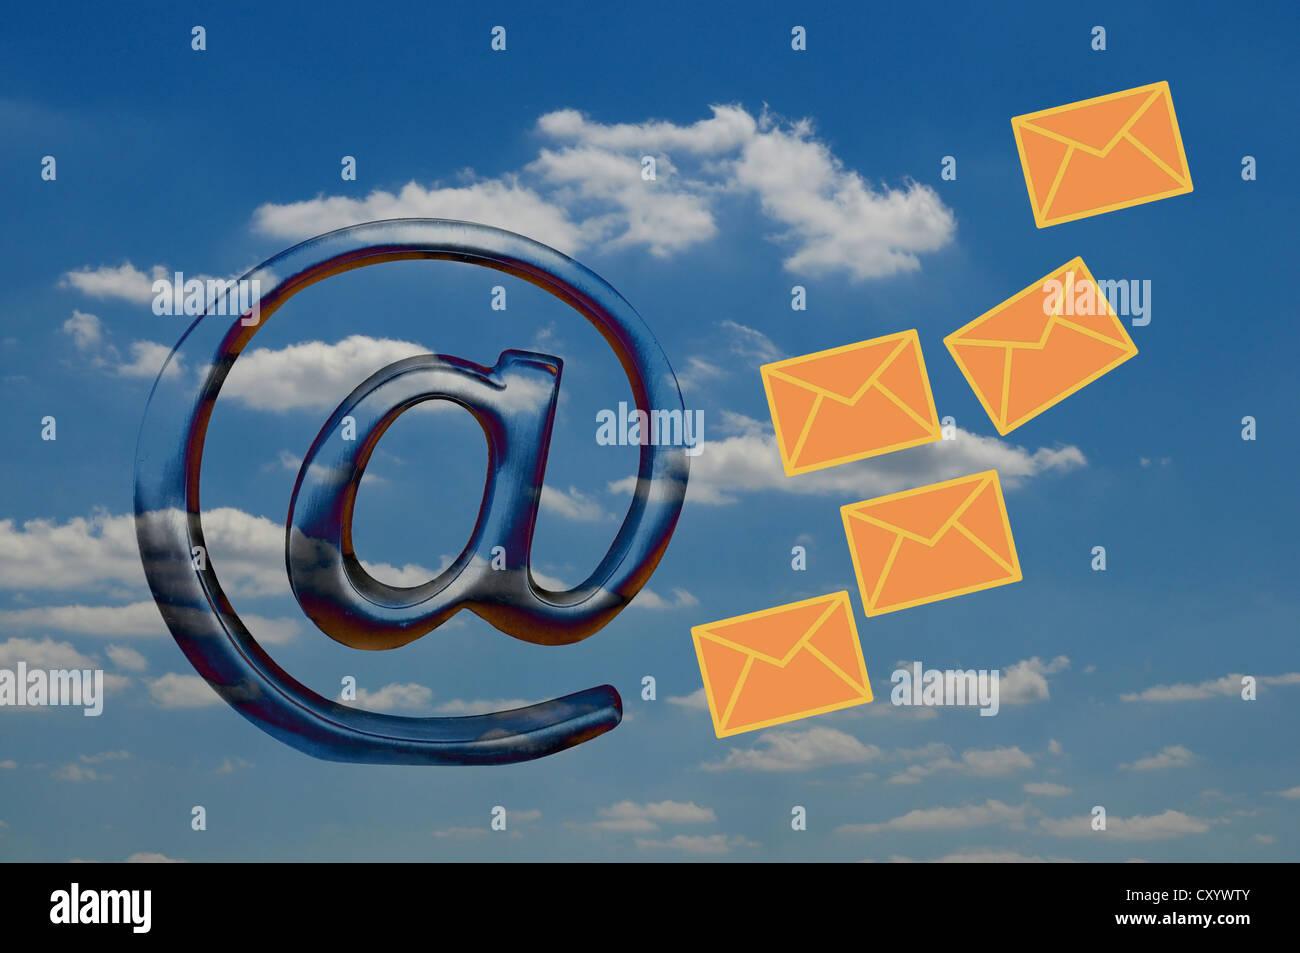 """At"" symbol, mail icon, symbolic image for Cloud Computing, illustration Stock Photo"